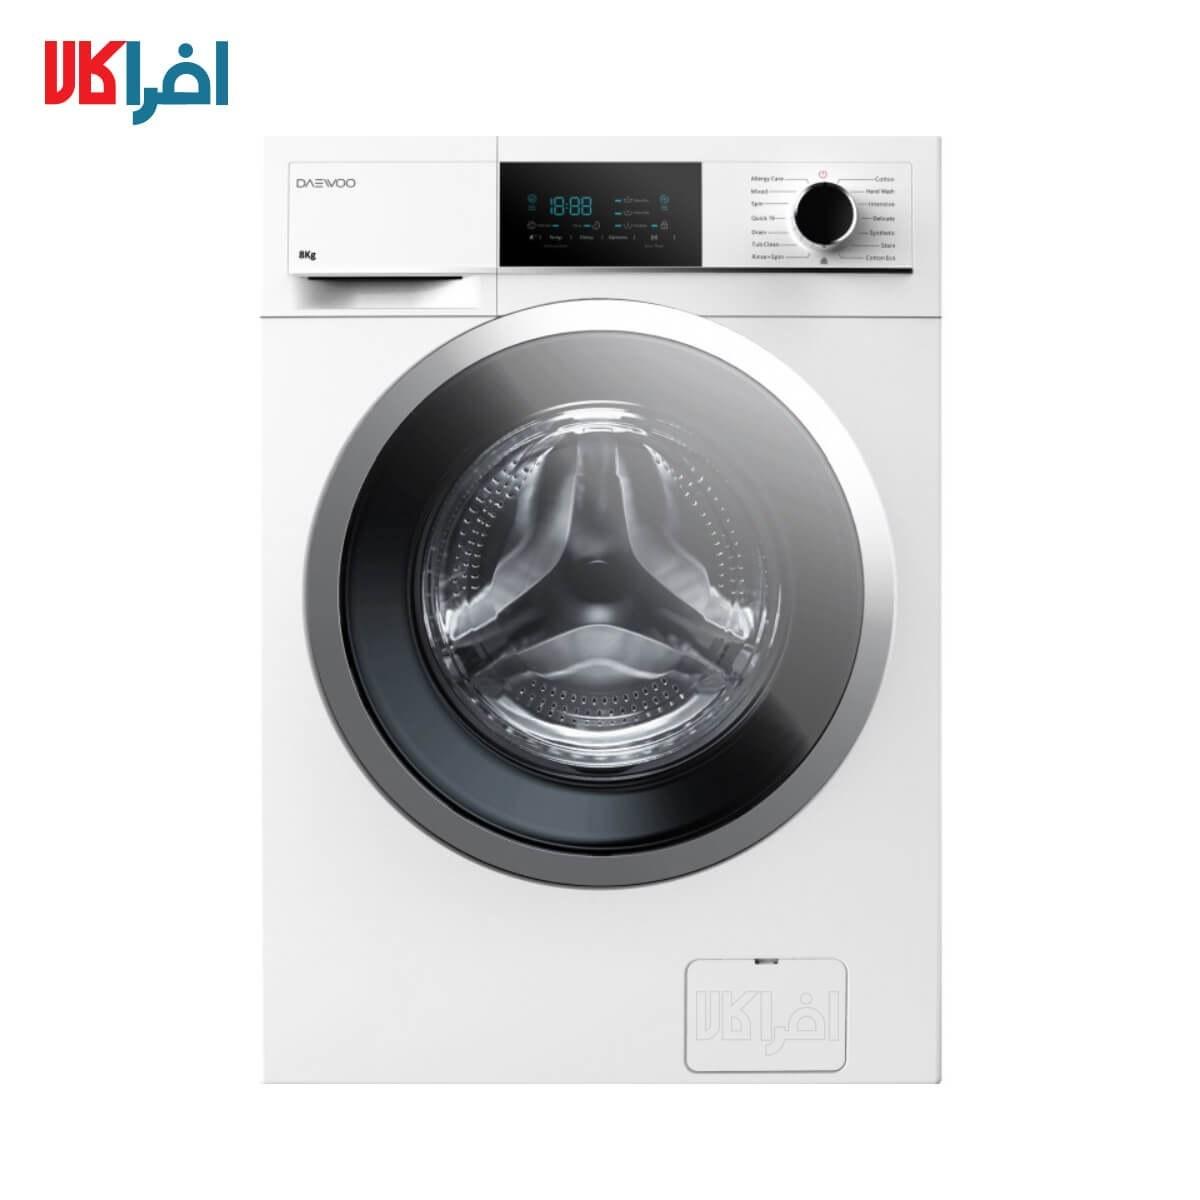 عکس ماشین لباسشویی دوو سری کاریزما مدل DWK-8020W ظرفیت 8 کیلوگرم DAEWOO WASHING MACHINE DWK-8020 8 KG ماشین-لباسشویی-دوو-سری-کاریزما-مدل-dwk-8020w-ظرفیت-8-کیلوگرم